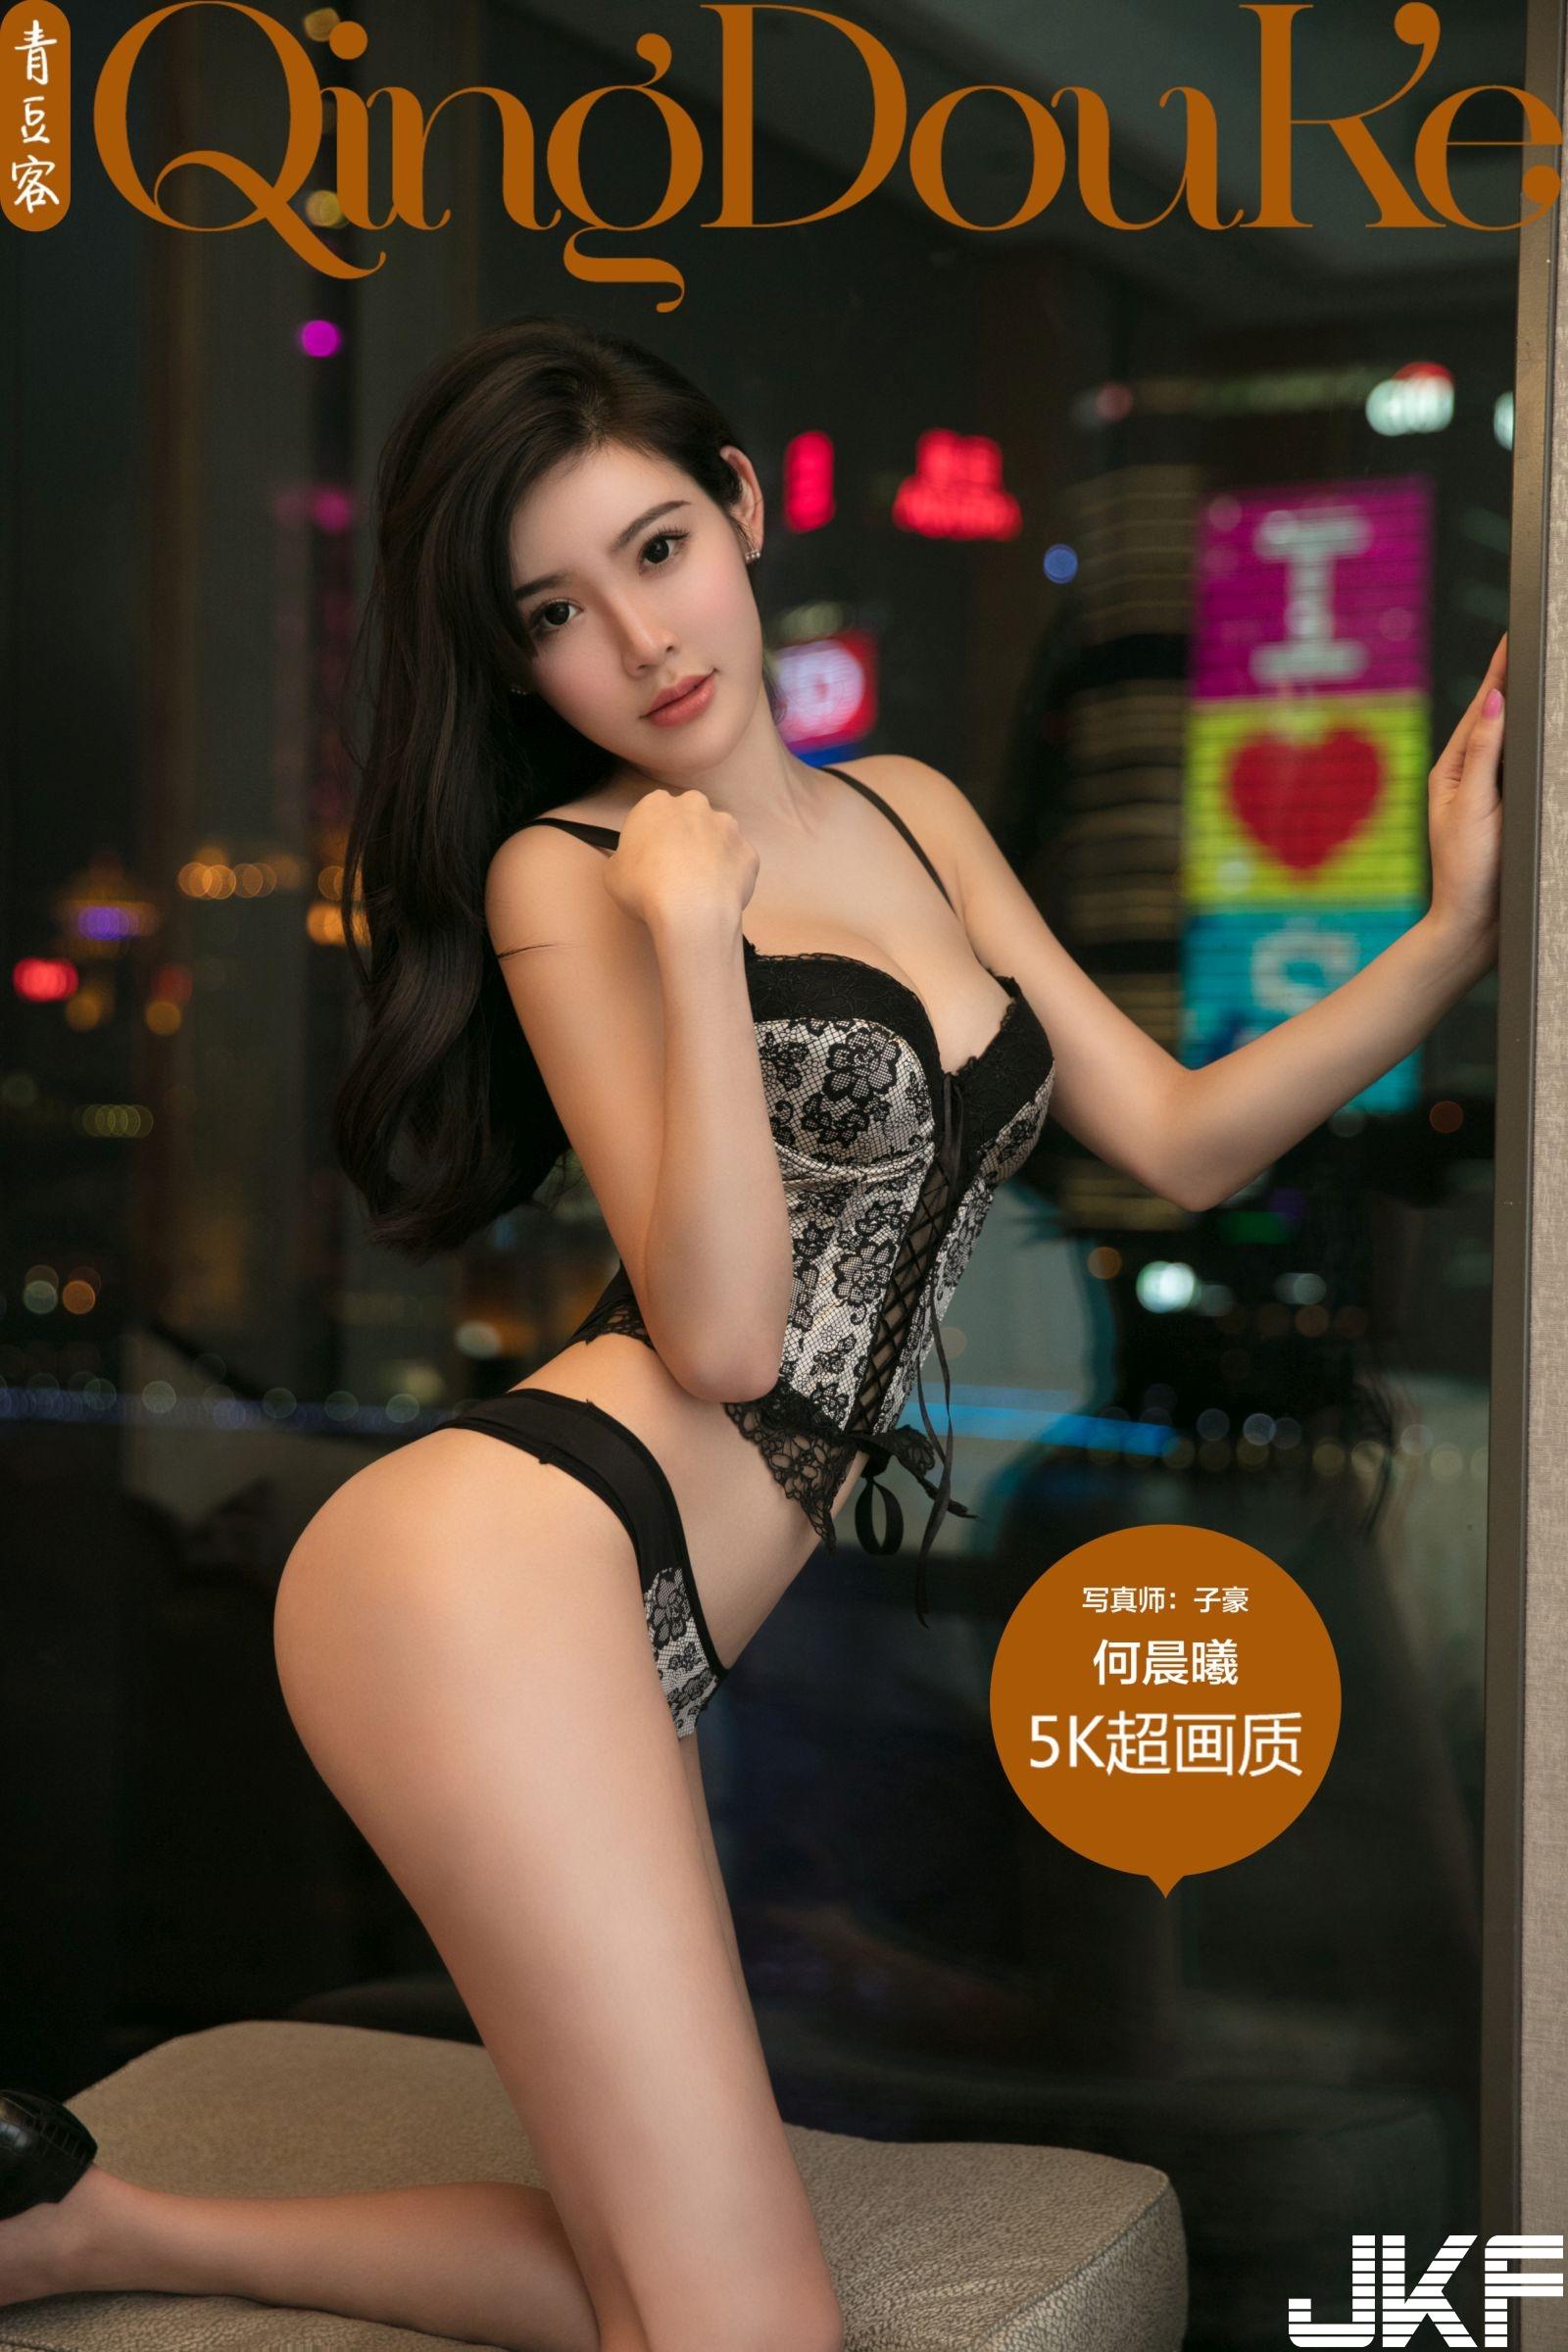 【QingDouke 青豆客系列】2017.09.06 何晨曦 性感寫真【56P】 - 貼圖 - 絲襪美腿 -